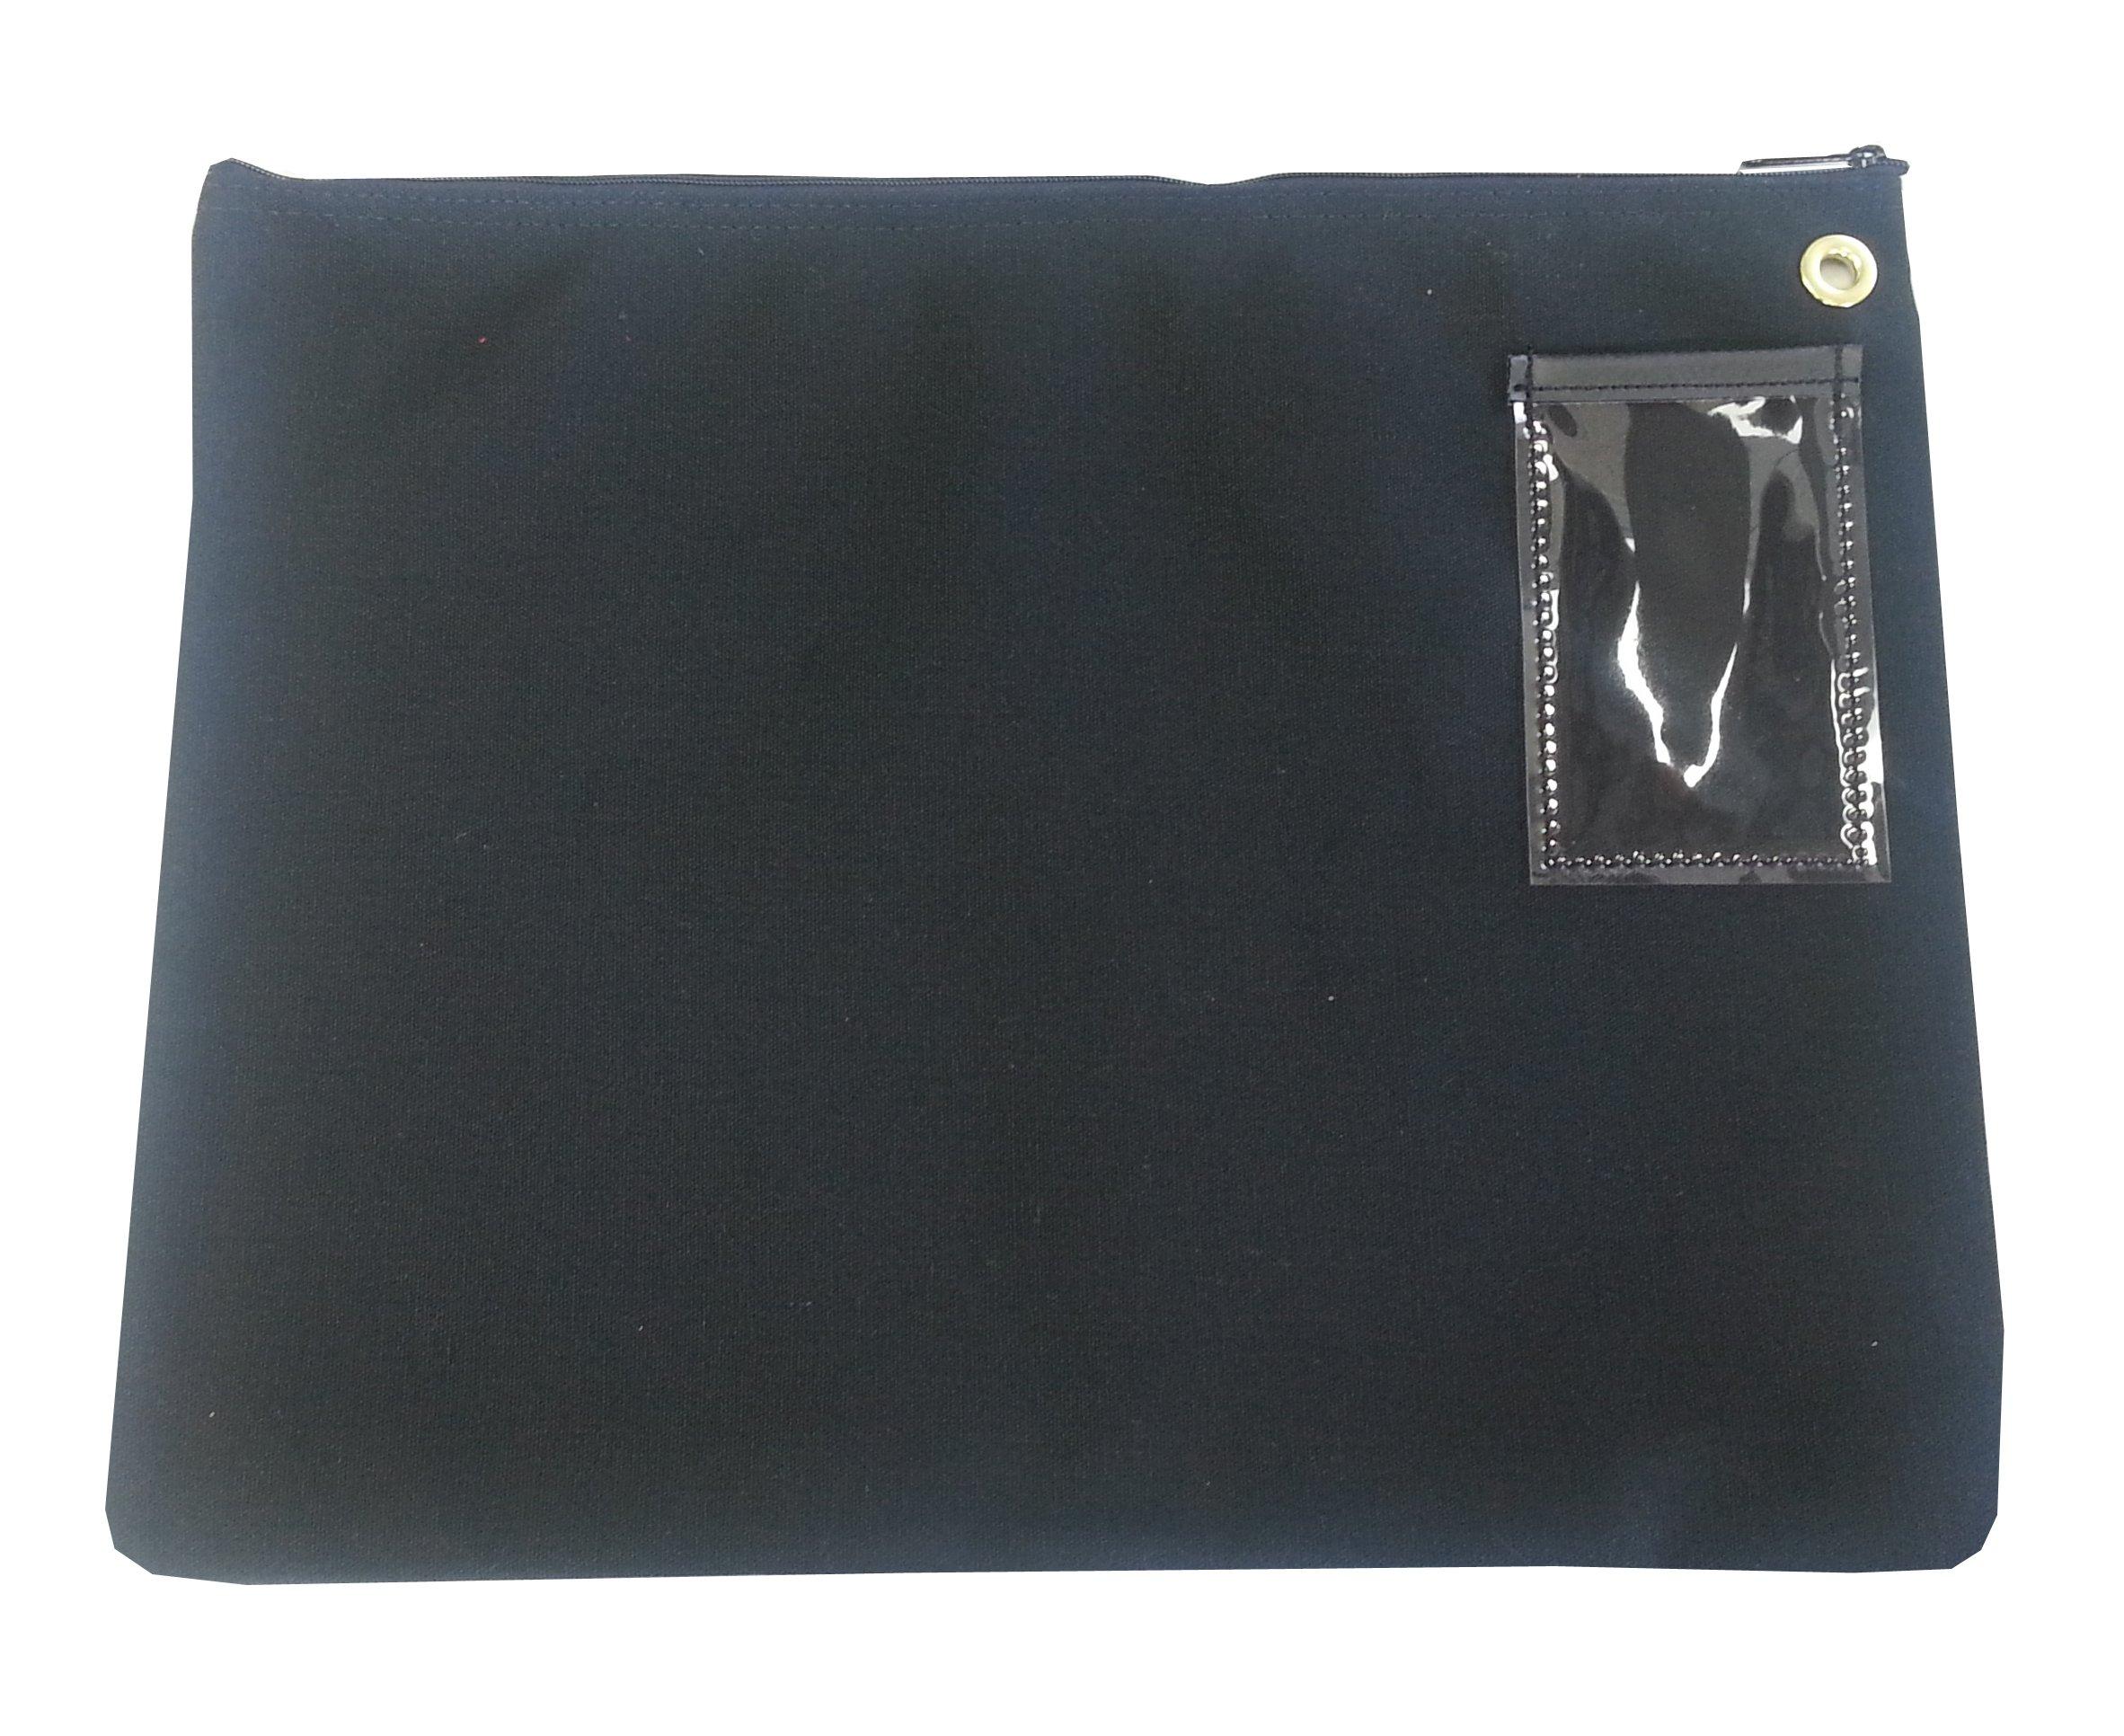 Interoffice Mailer Canvas Transit Sack Zipper Bag 18w x 14h Black by Cardinal bag supplies